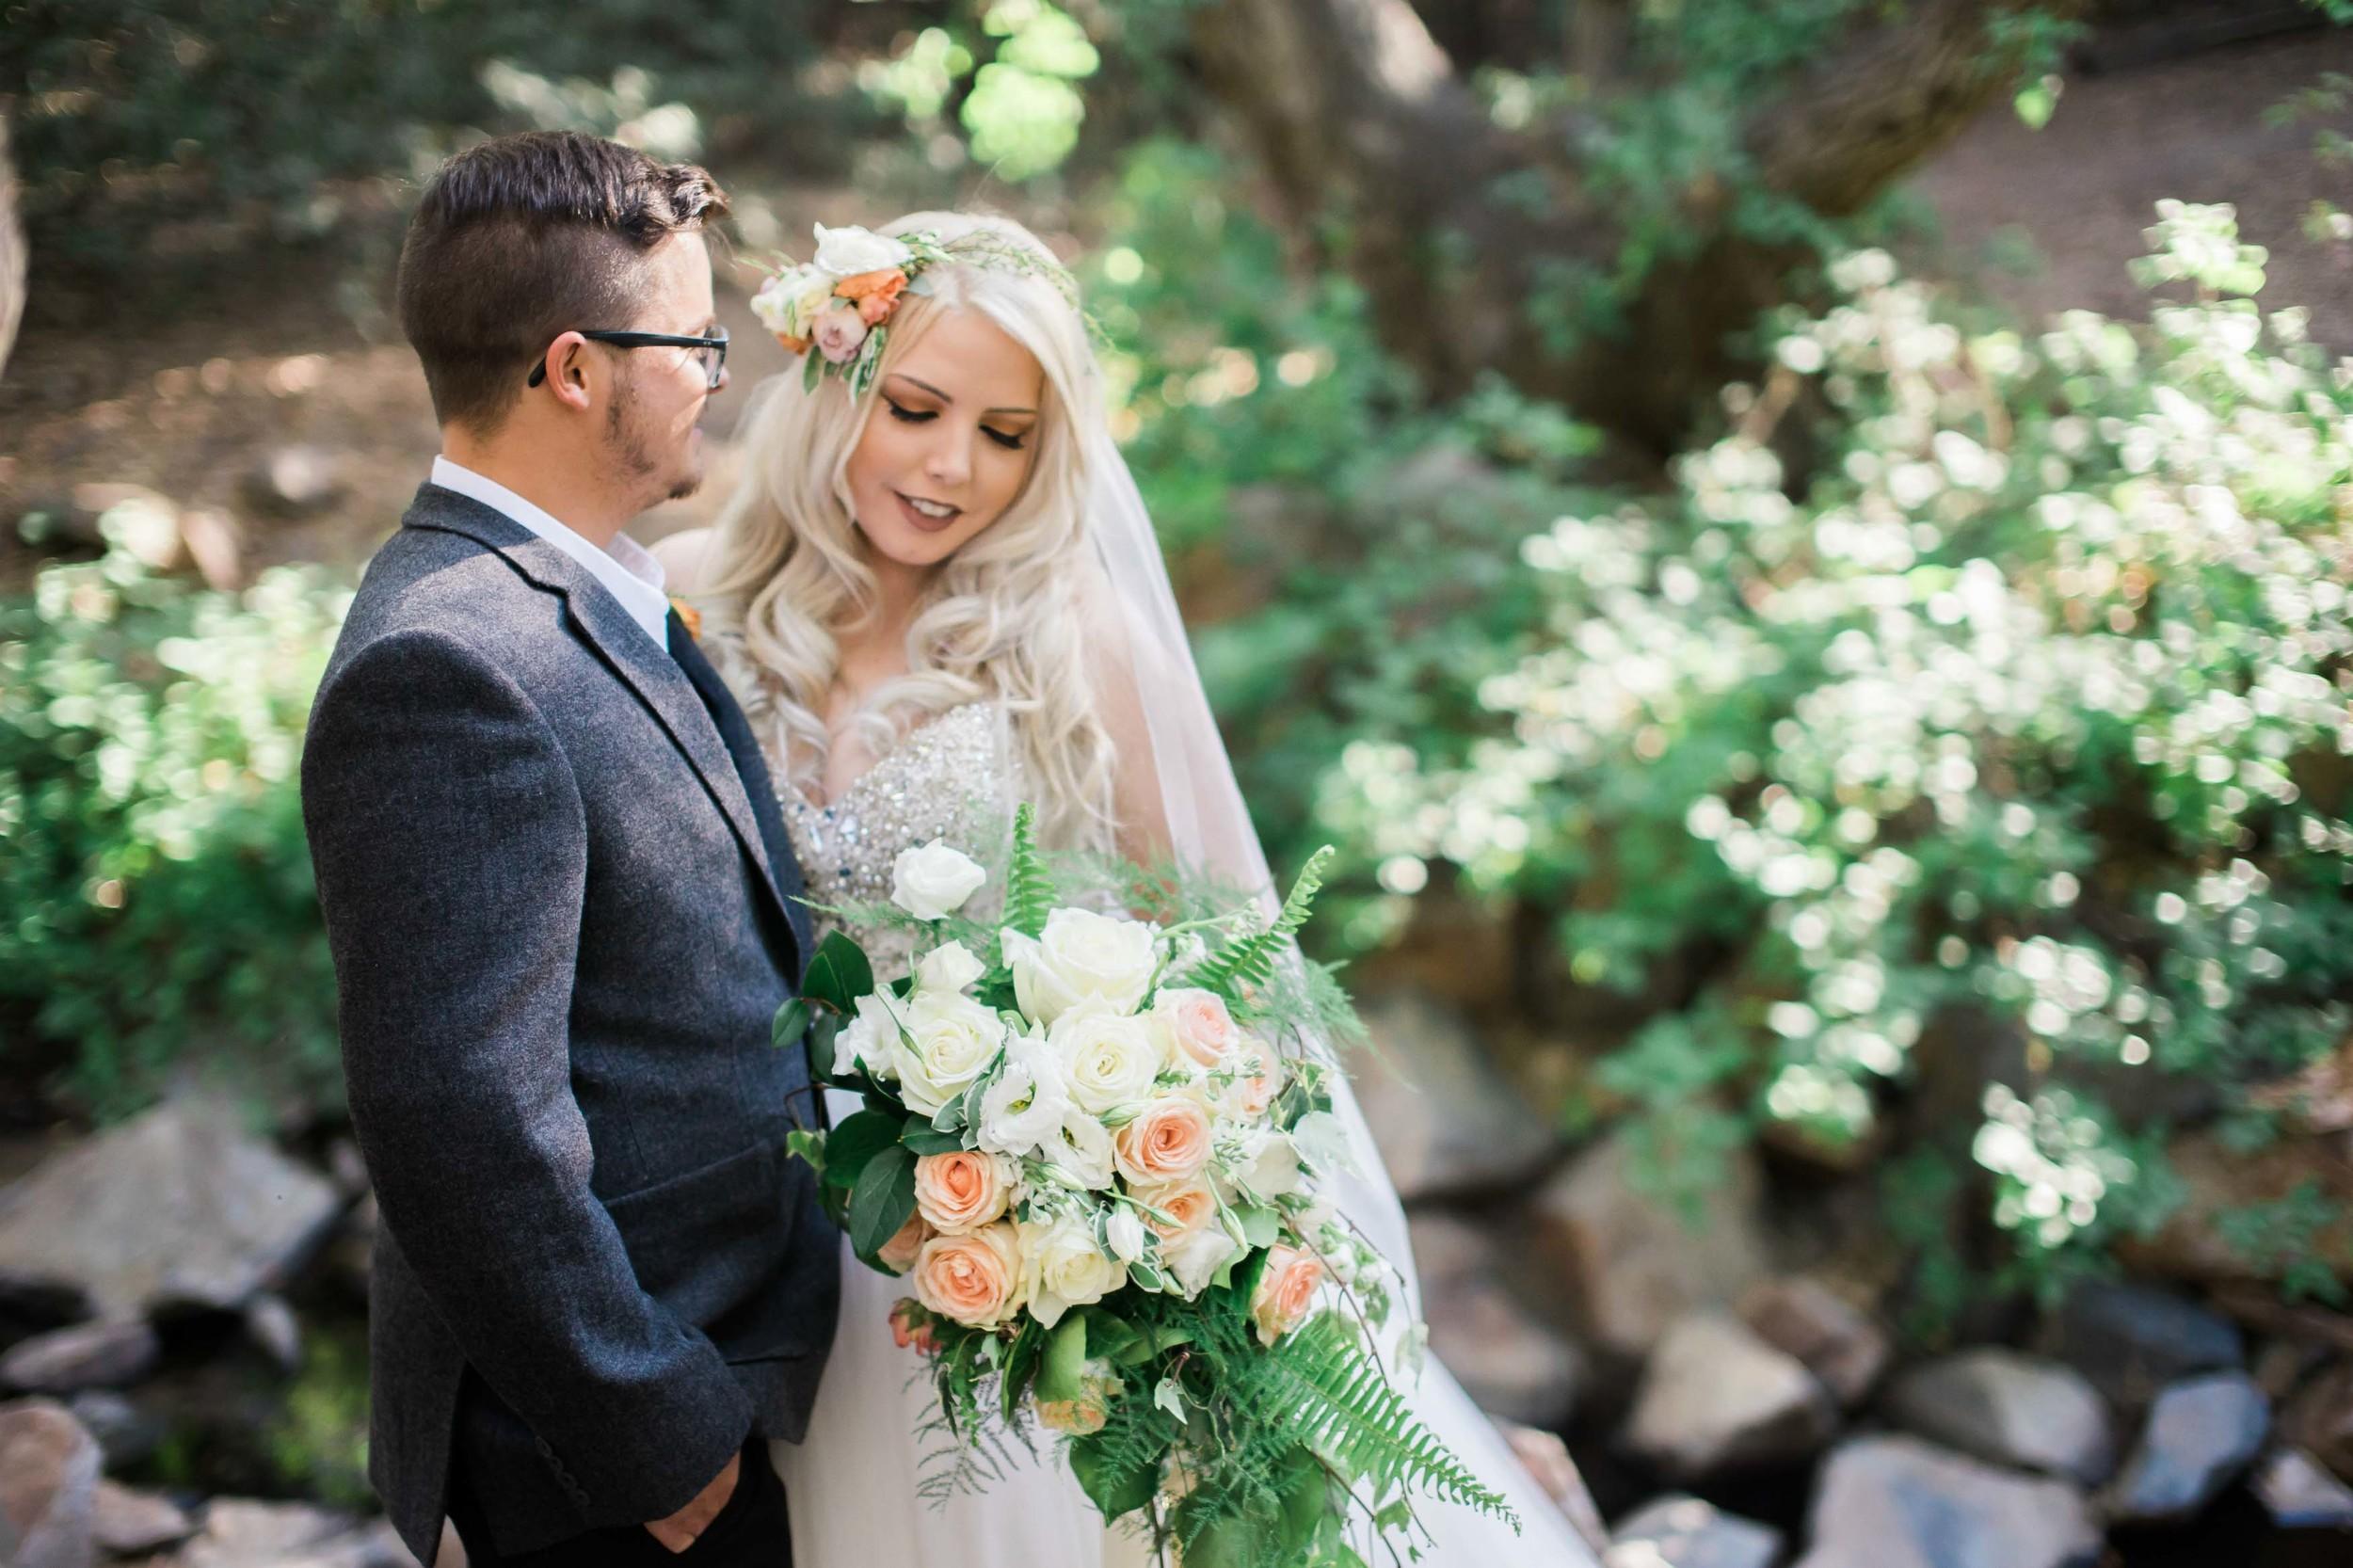 Kiara_and_Corbin_WEDDING_ Brienne_Michelle_Photography_057.JPG